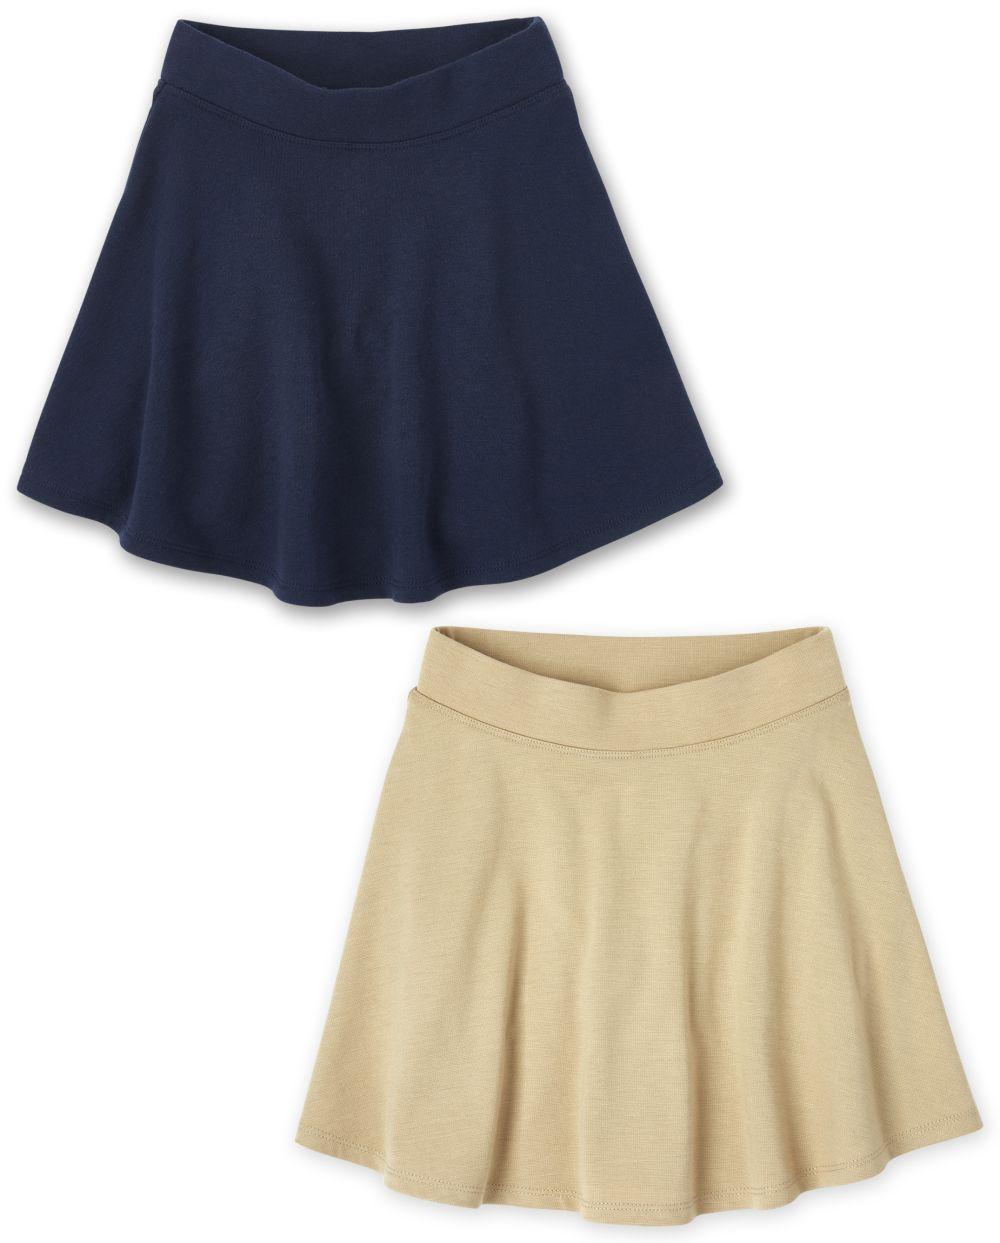 Girls Uniform Ponte Knit Skort 2-Pack